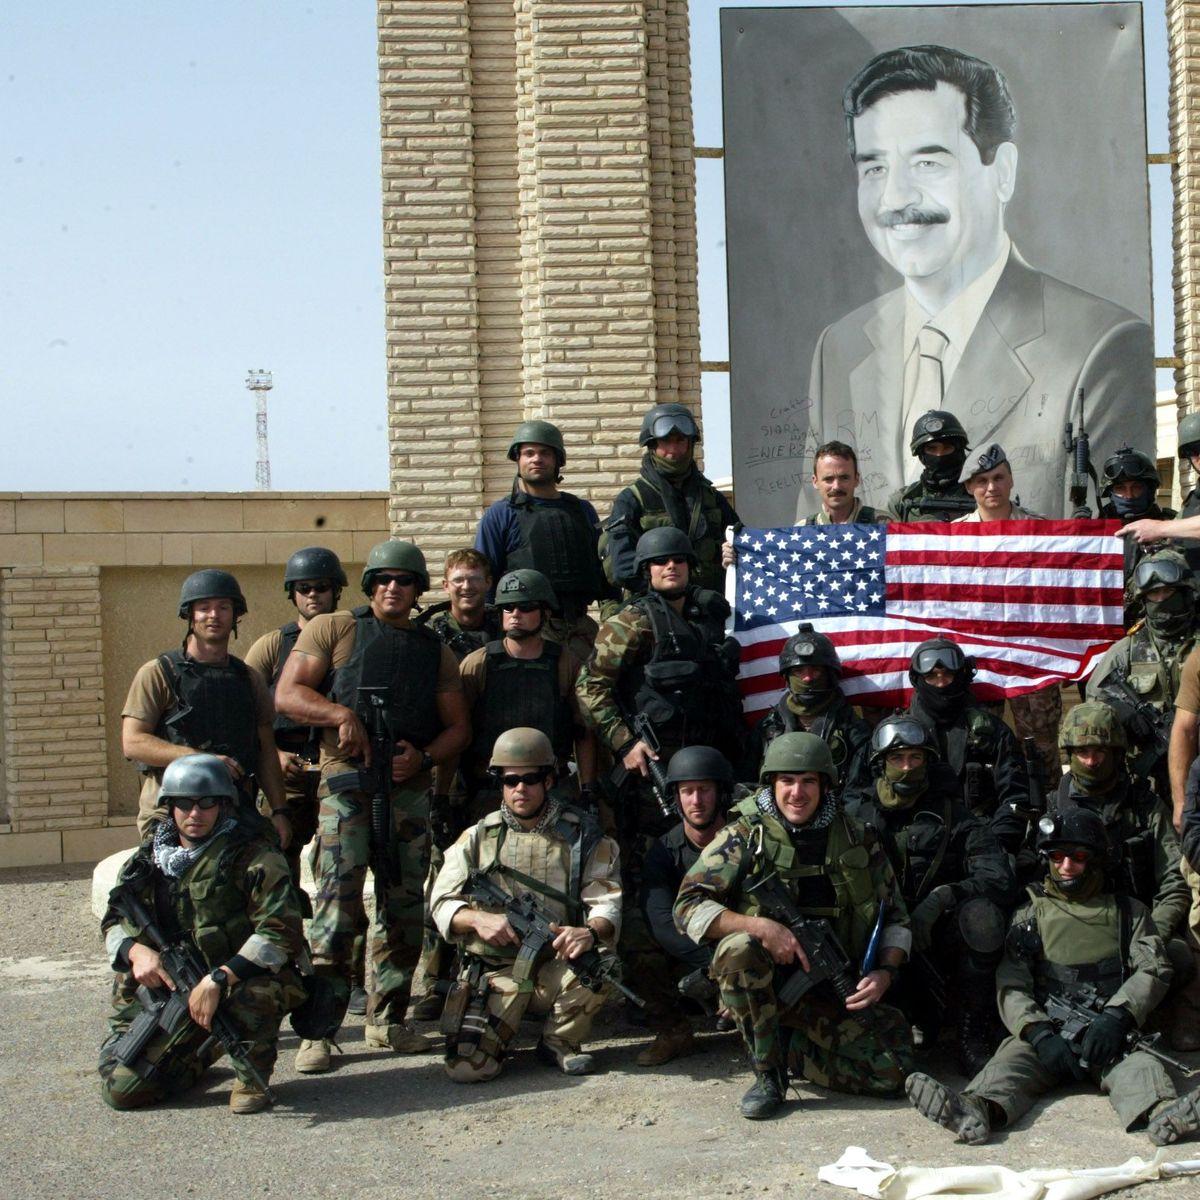 did we declare war on iraq